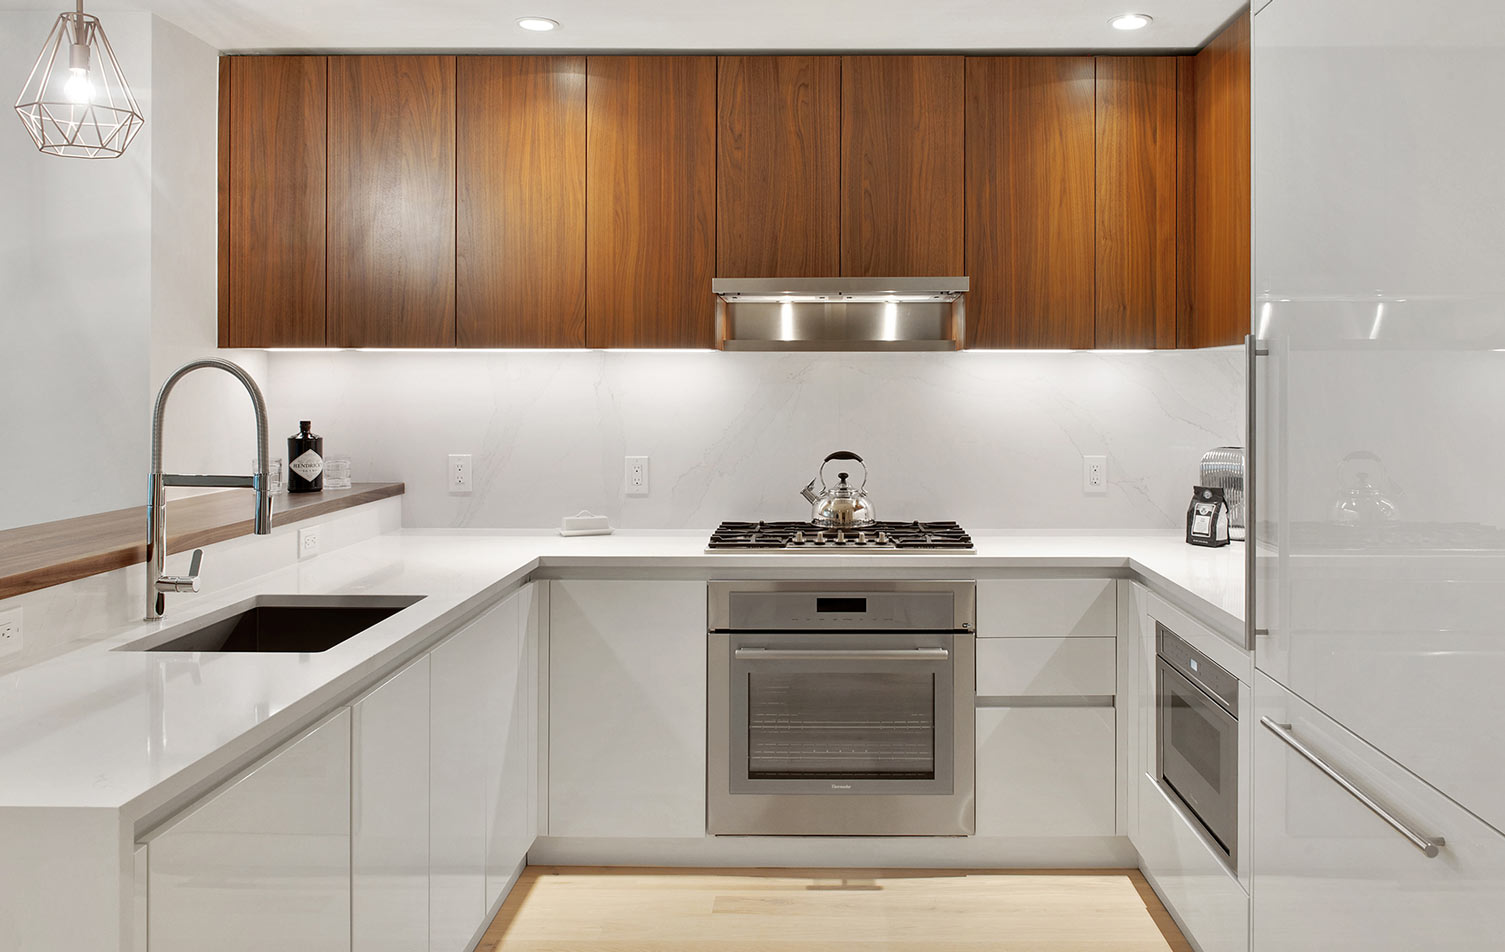 Kitchen with butcher block island